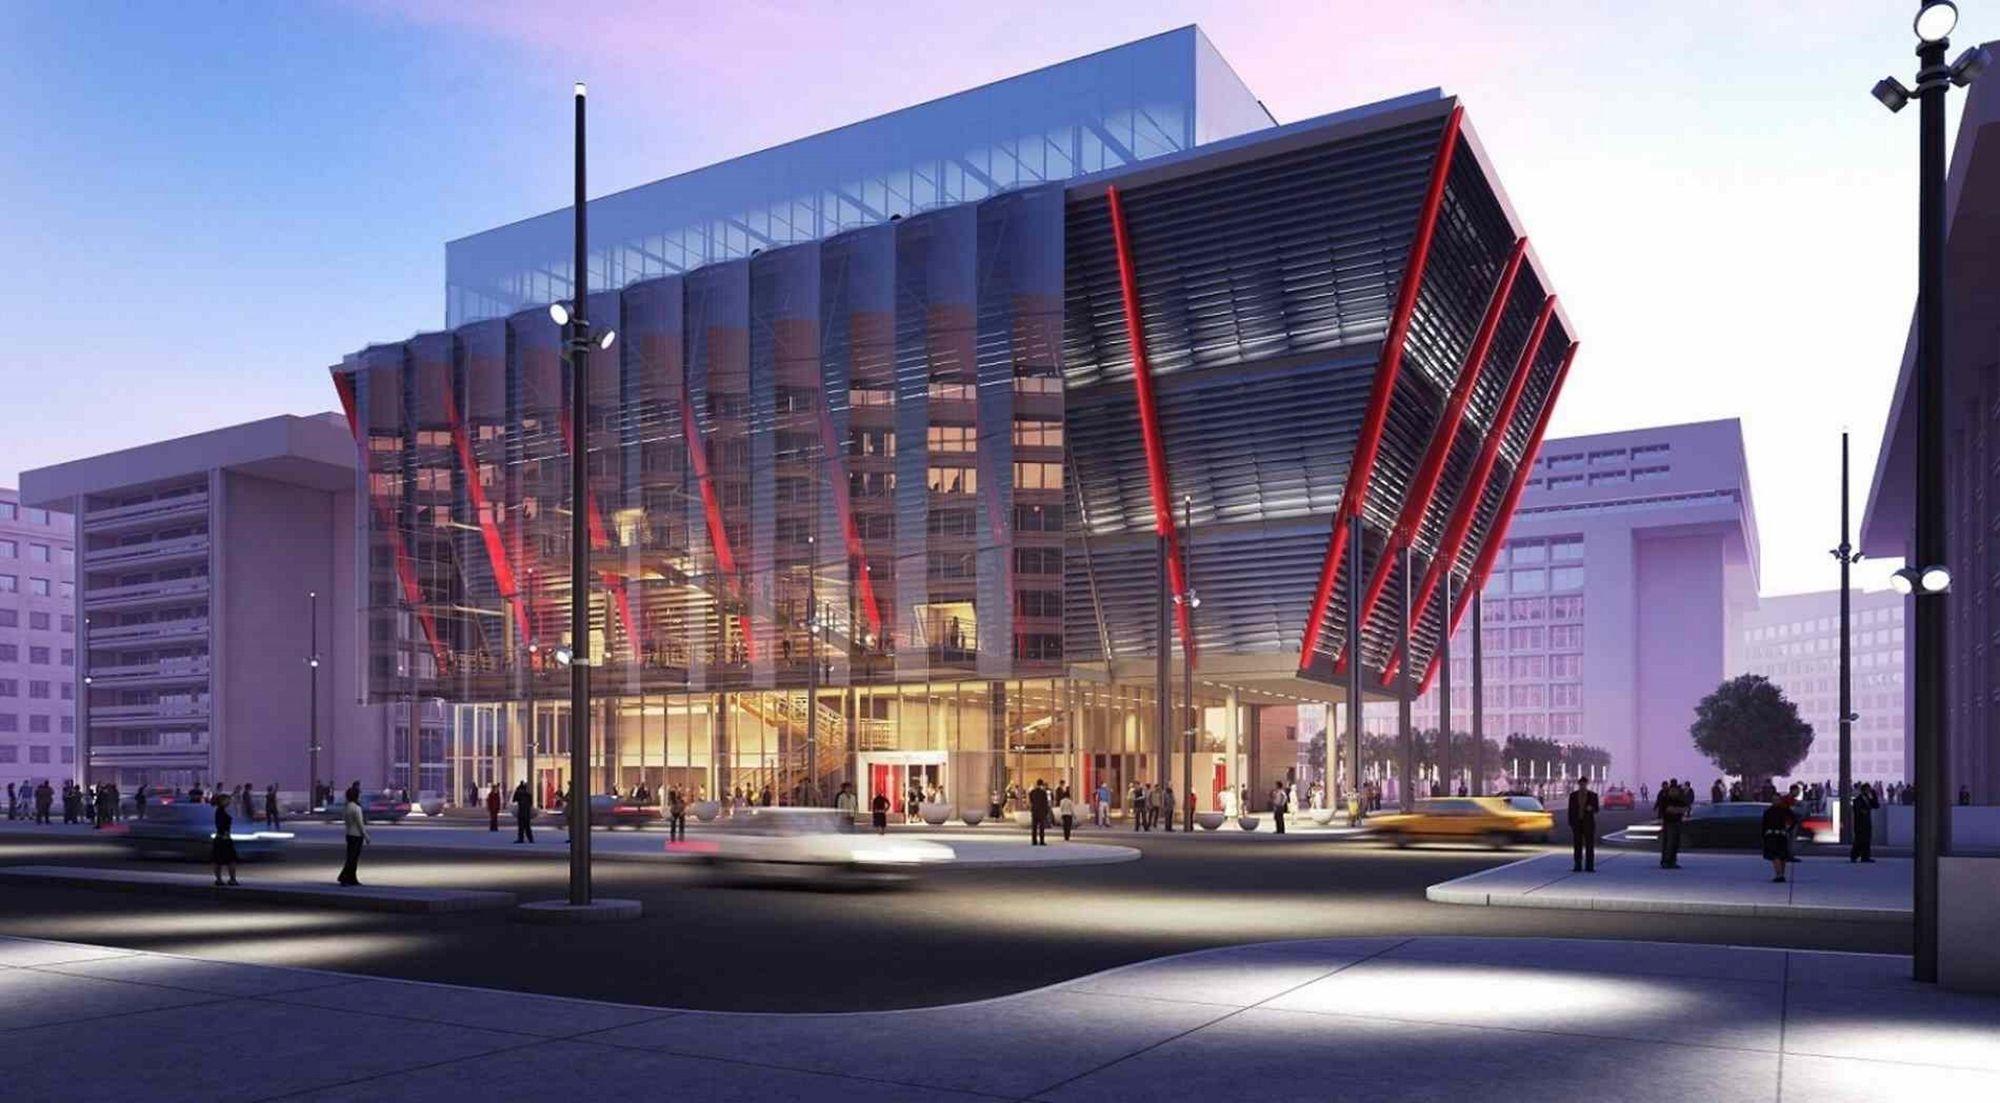 Napa Valley Hotels >> Hilton Washington DC National Mall - Hotels Villas Direct